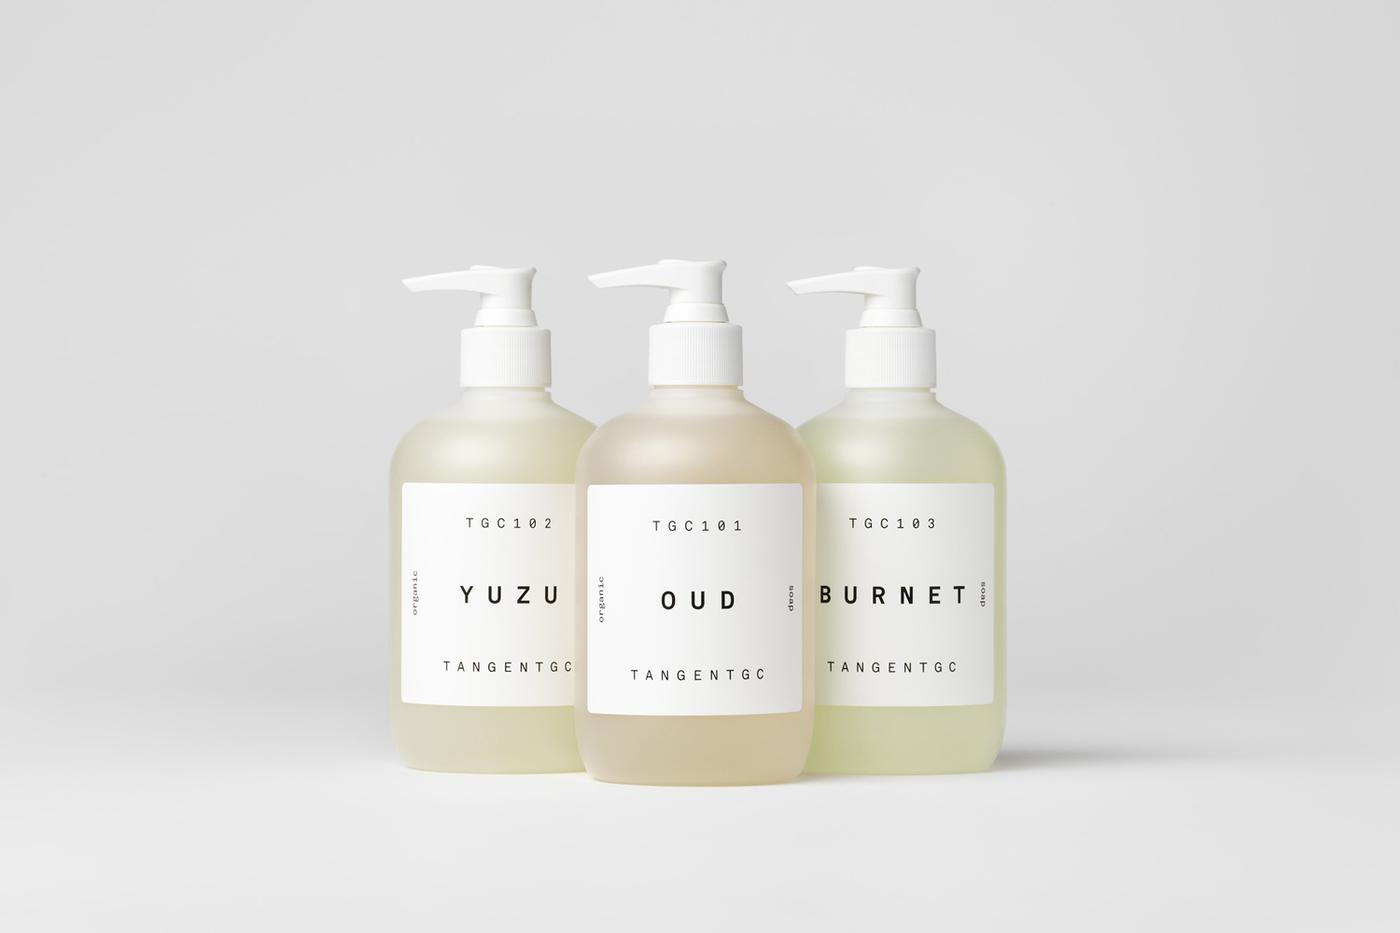 06-Tangent-GC-Soap-Packaging-Carl-Nas-Associates-London-UK-BPO.jpeg